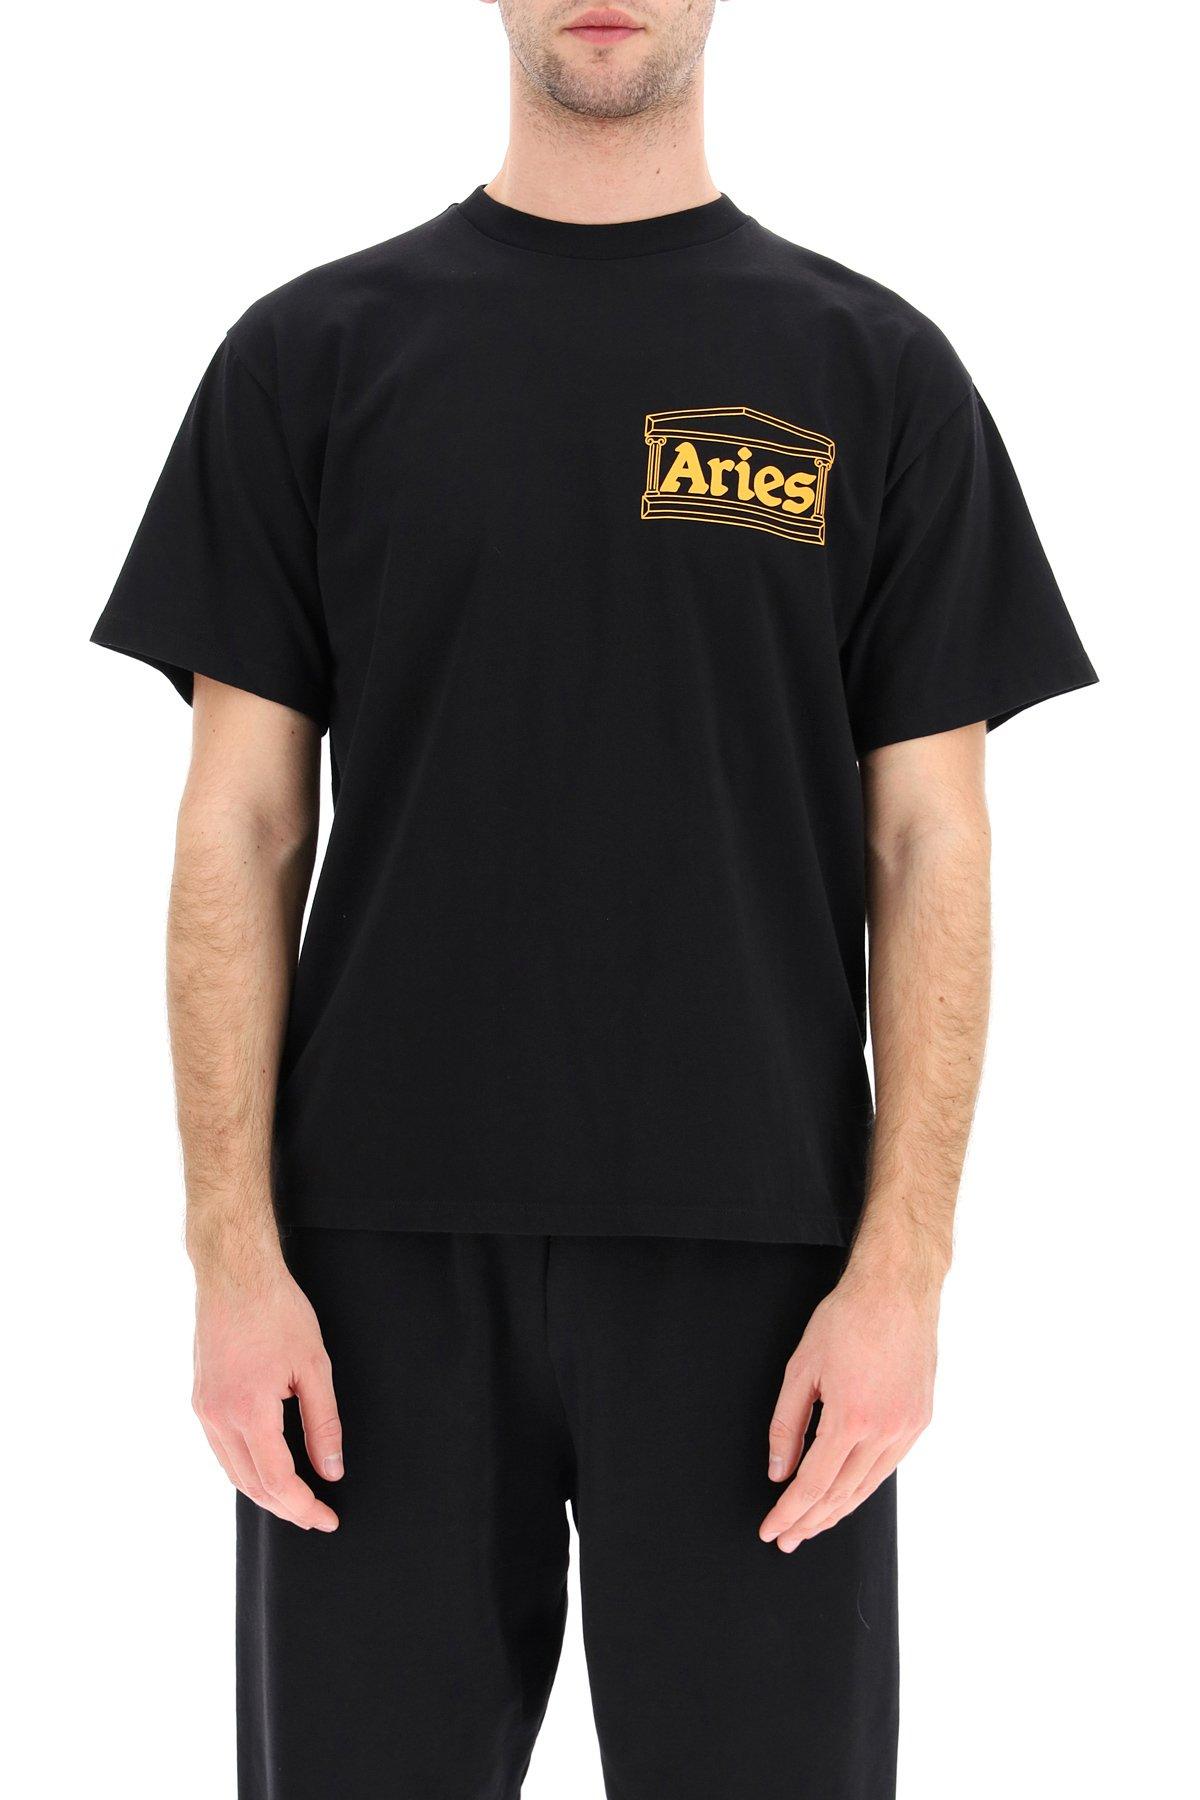 Aries t-shirt stampa logo noodles